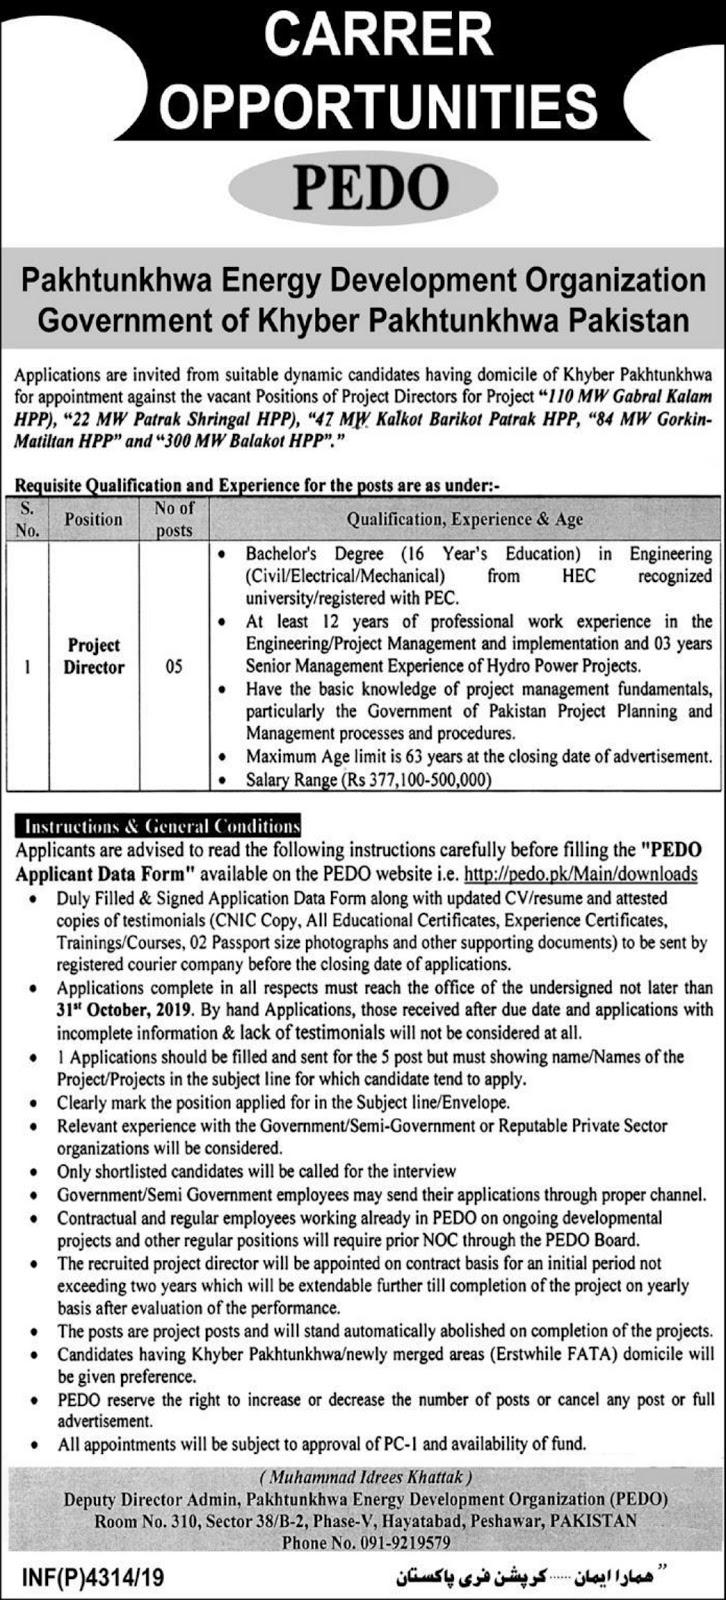 Energy Development Organization PEDO Jobs For Project Director